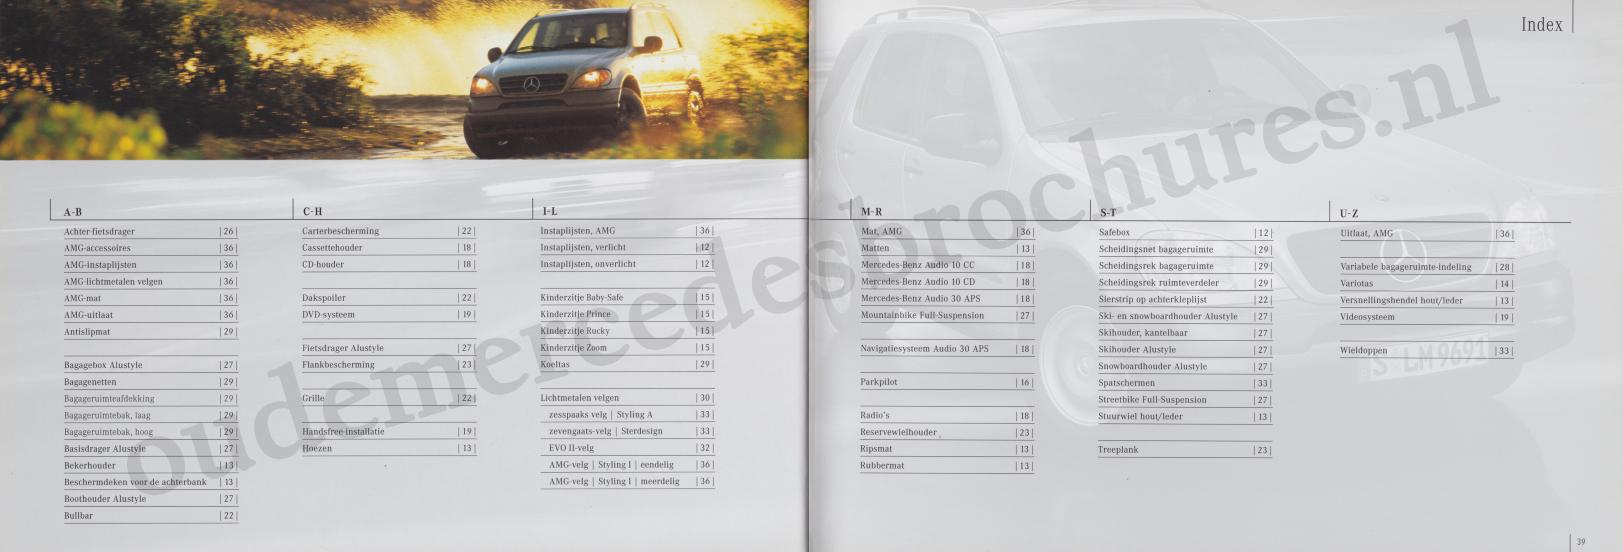 (W163): Catálogo 2001 - acessórios - neerlandês 020